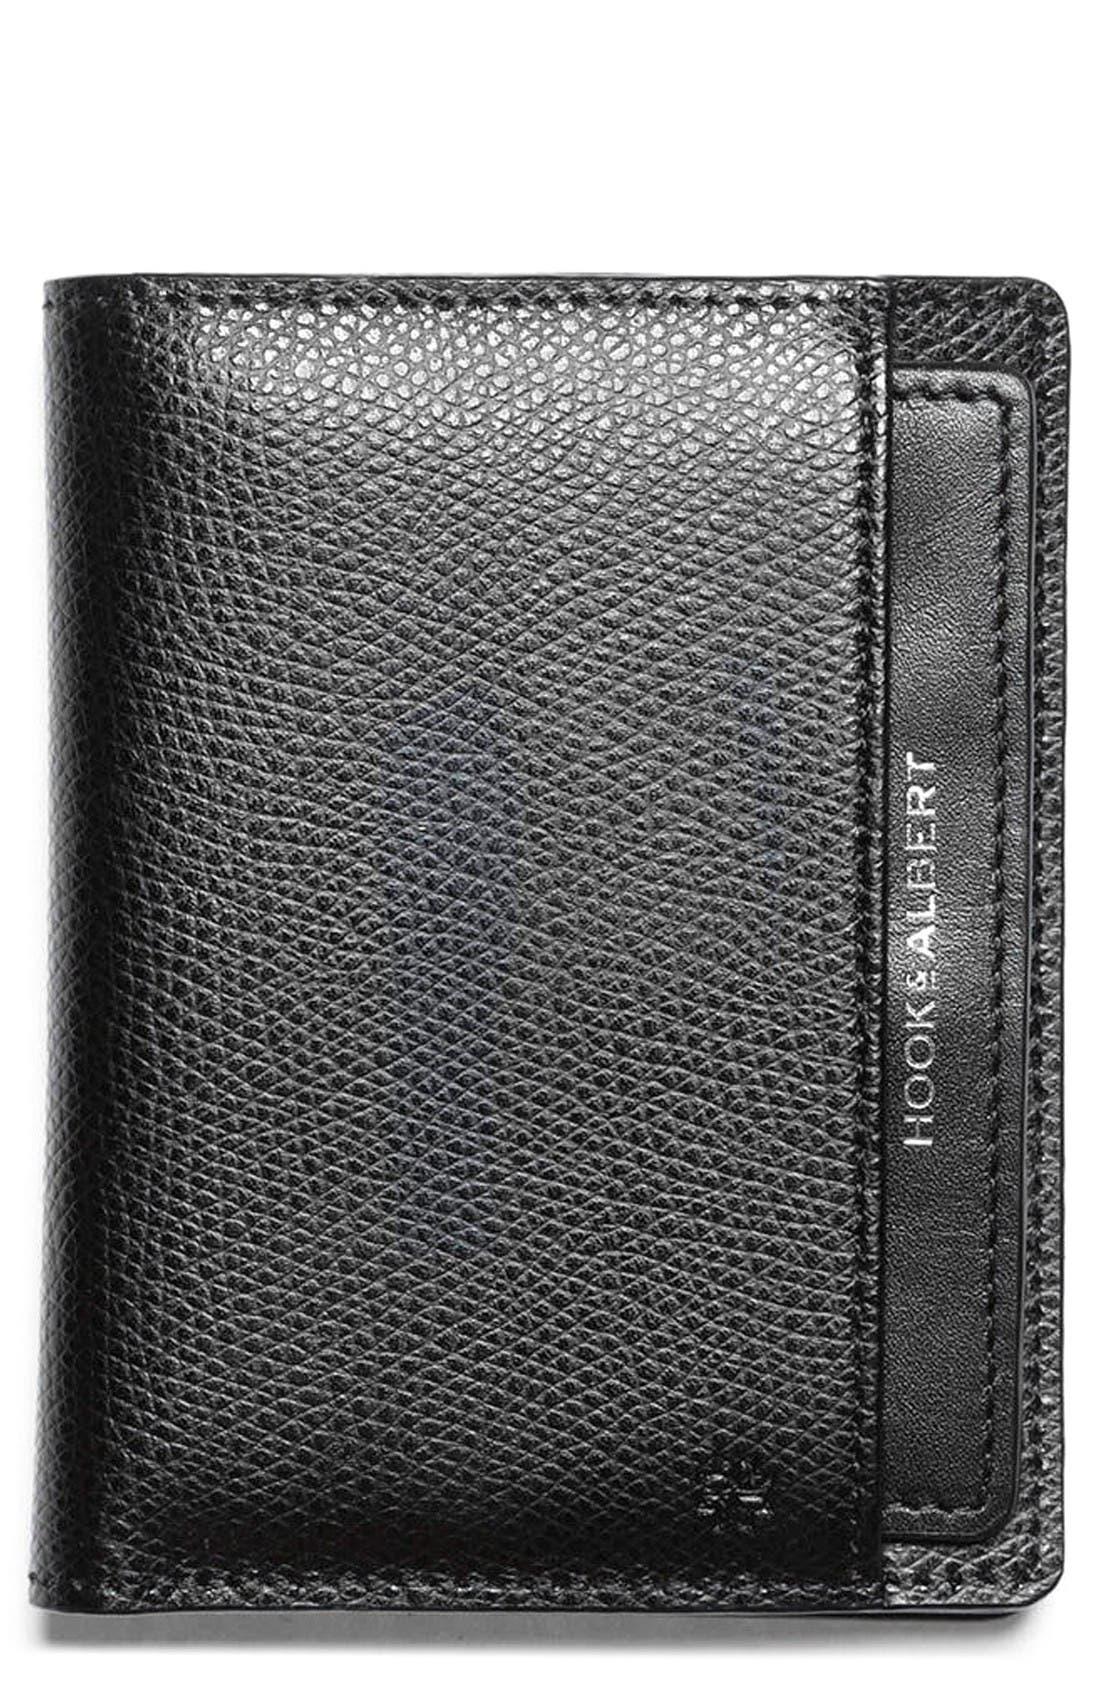 Main Image - Hook + Albert Leather Bifold Wallet